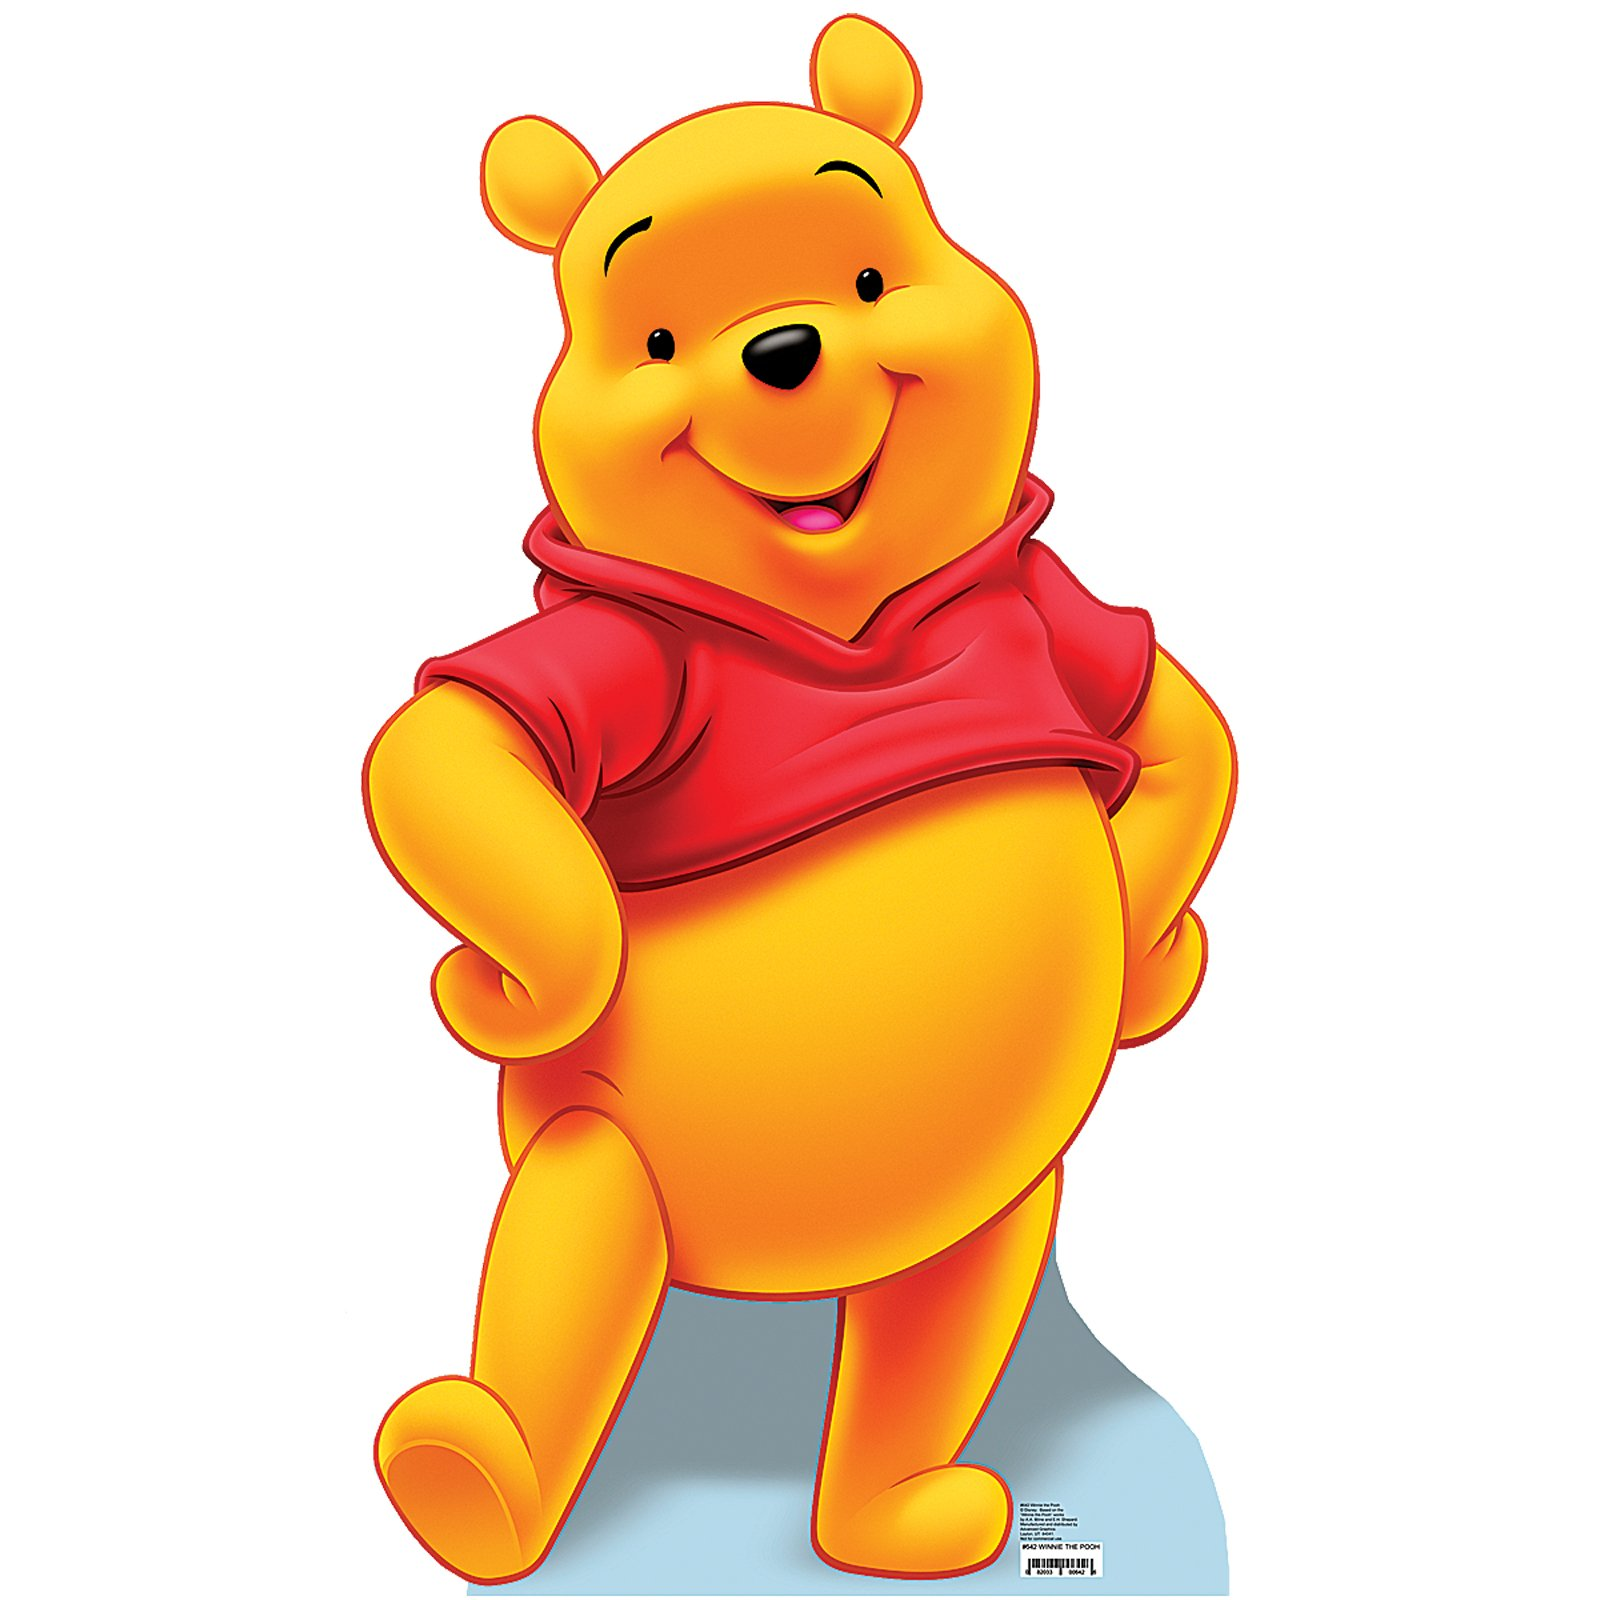 Pooh bear clipart.